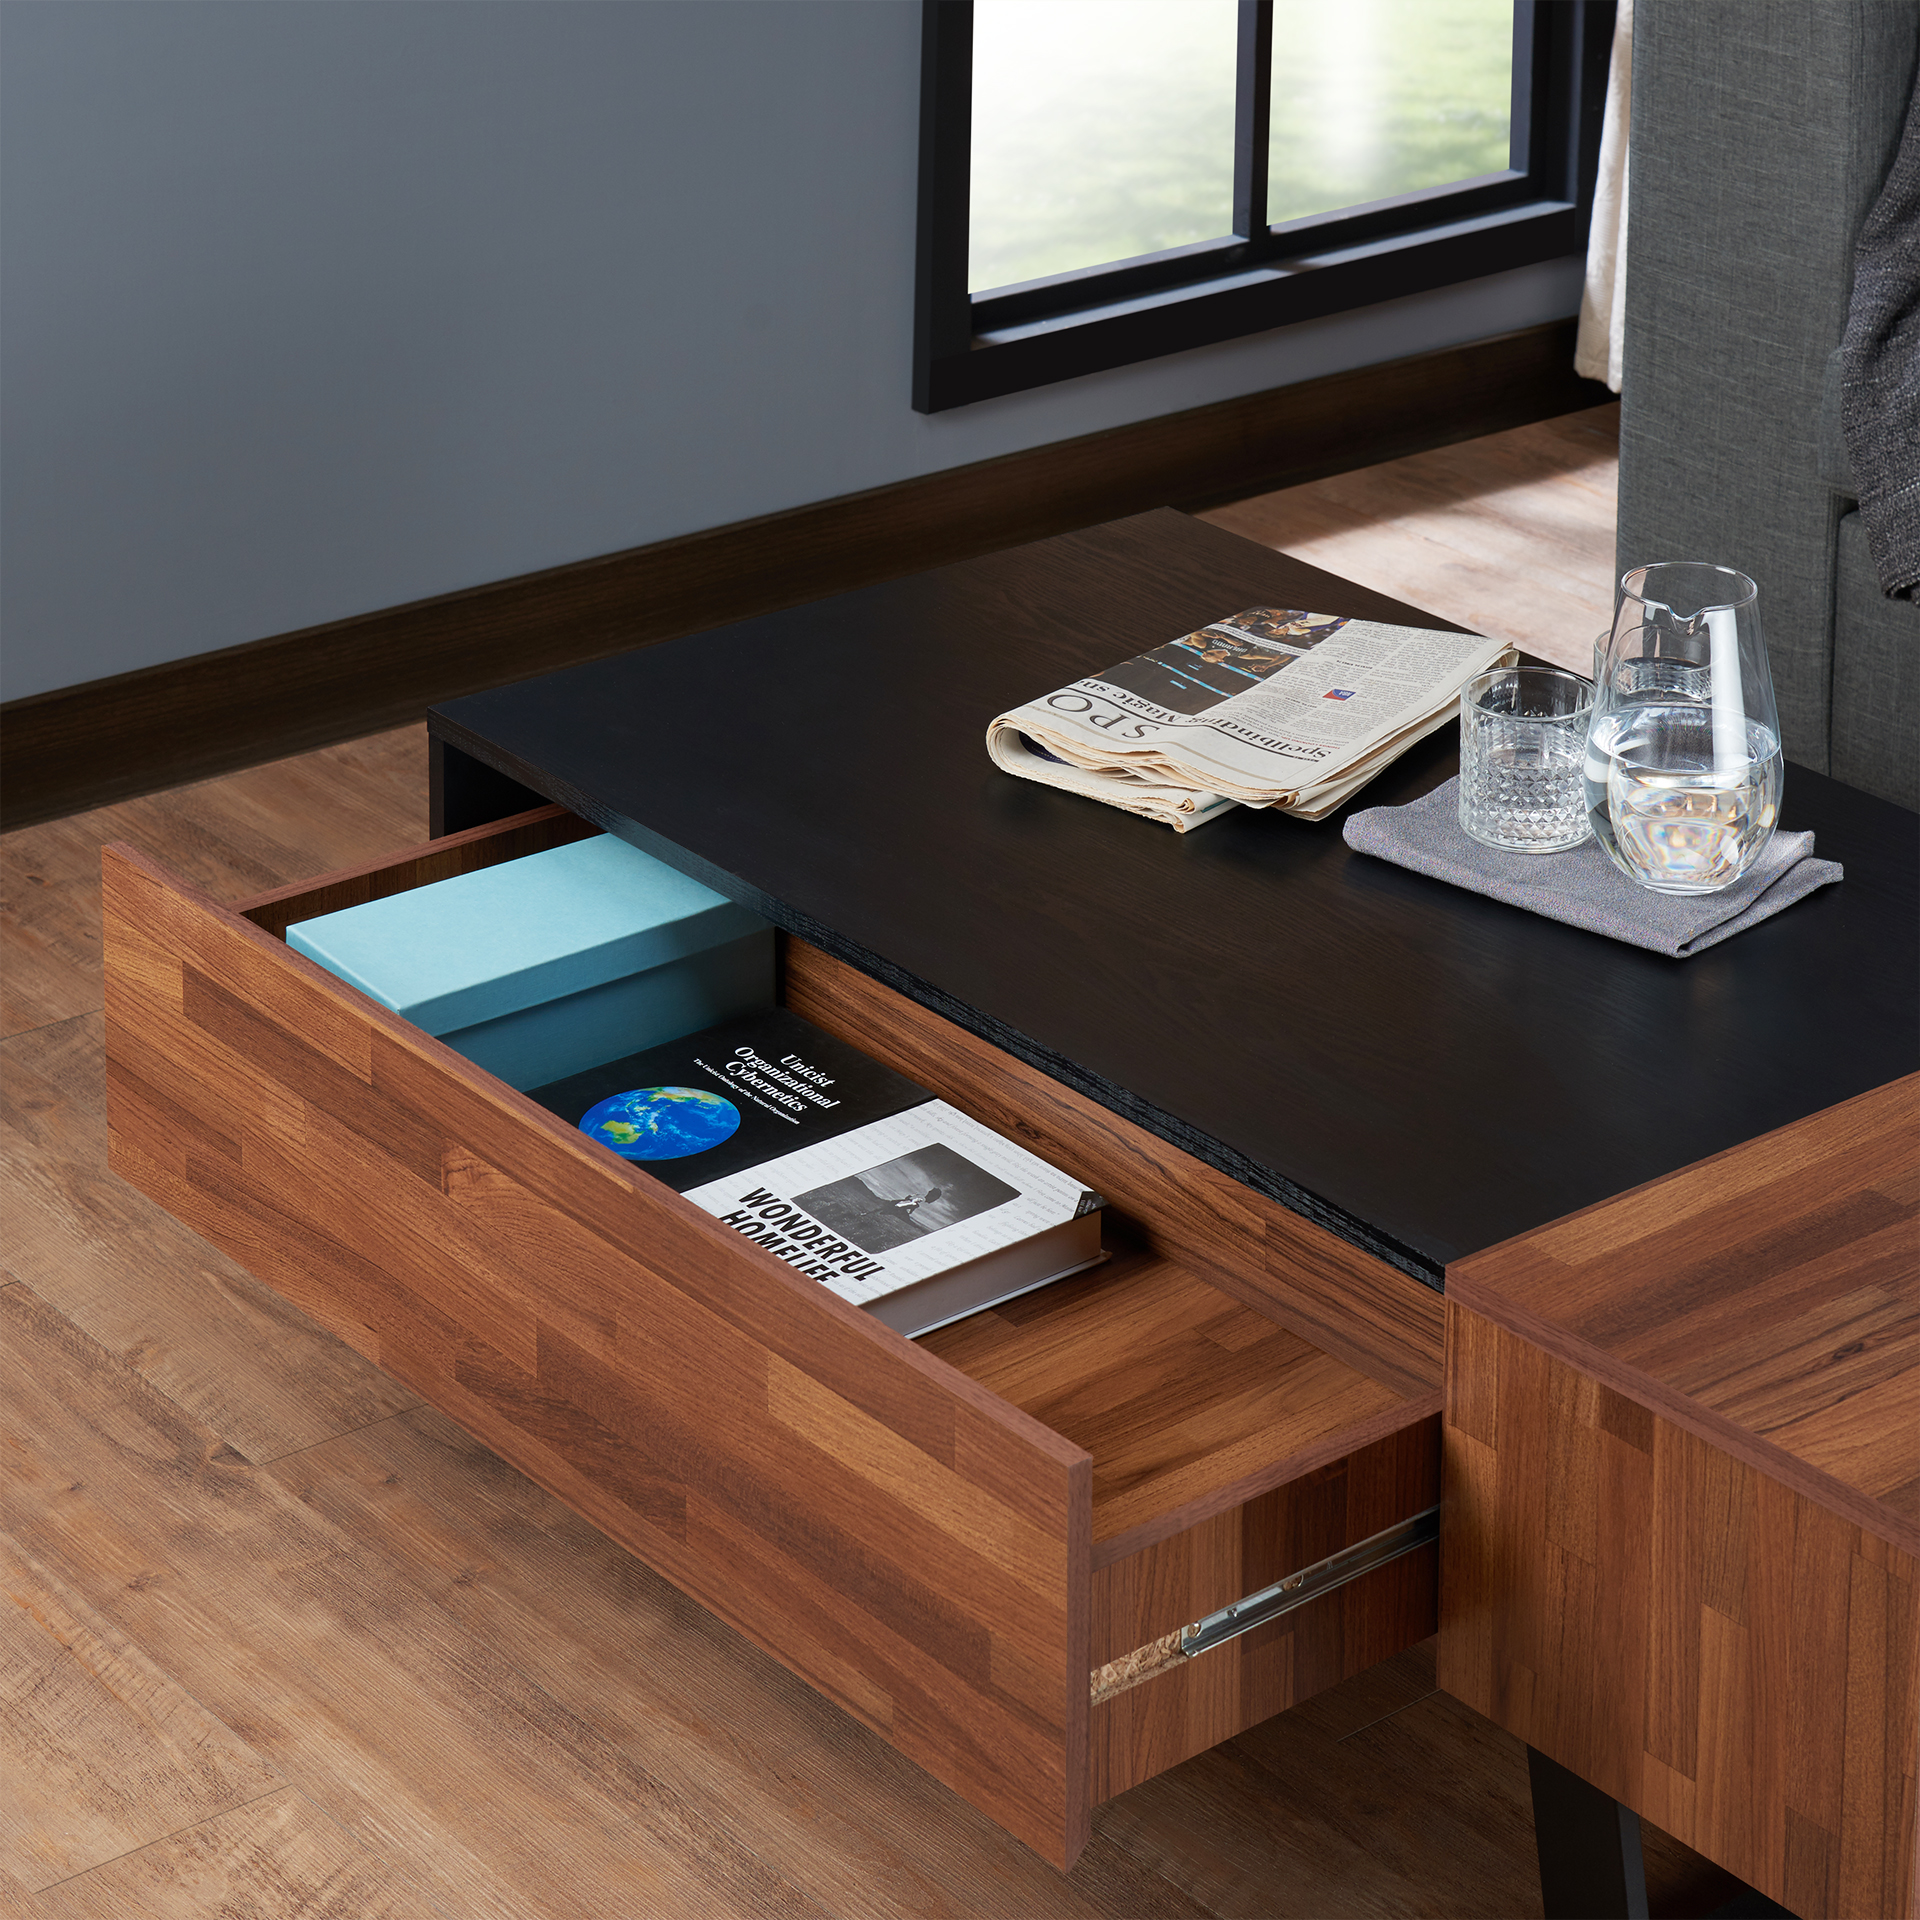 teak retro furniture wood dark teak retro coffee table office and home living room furniture manufacturers slicethinner